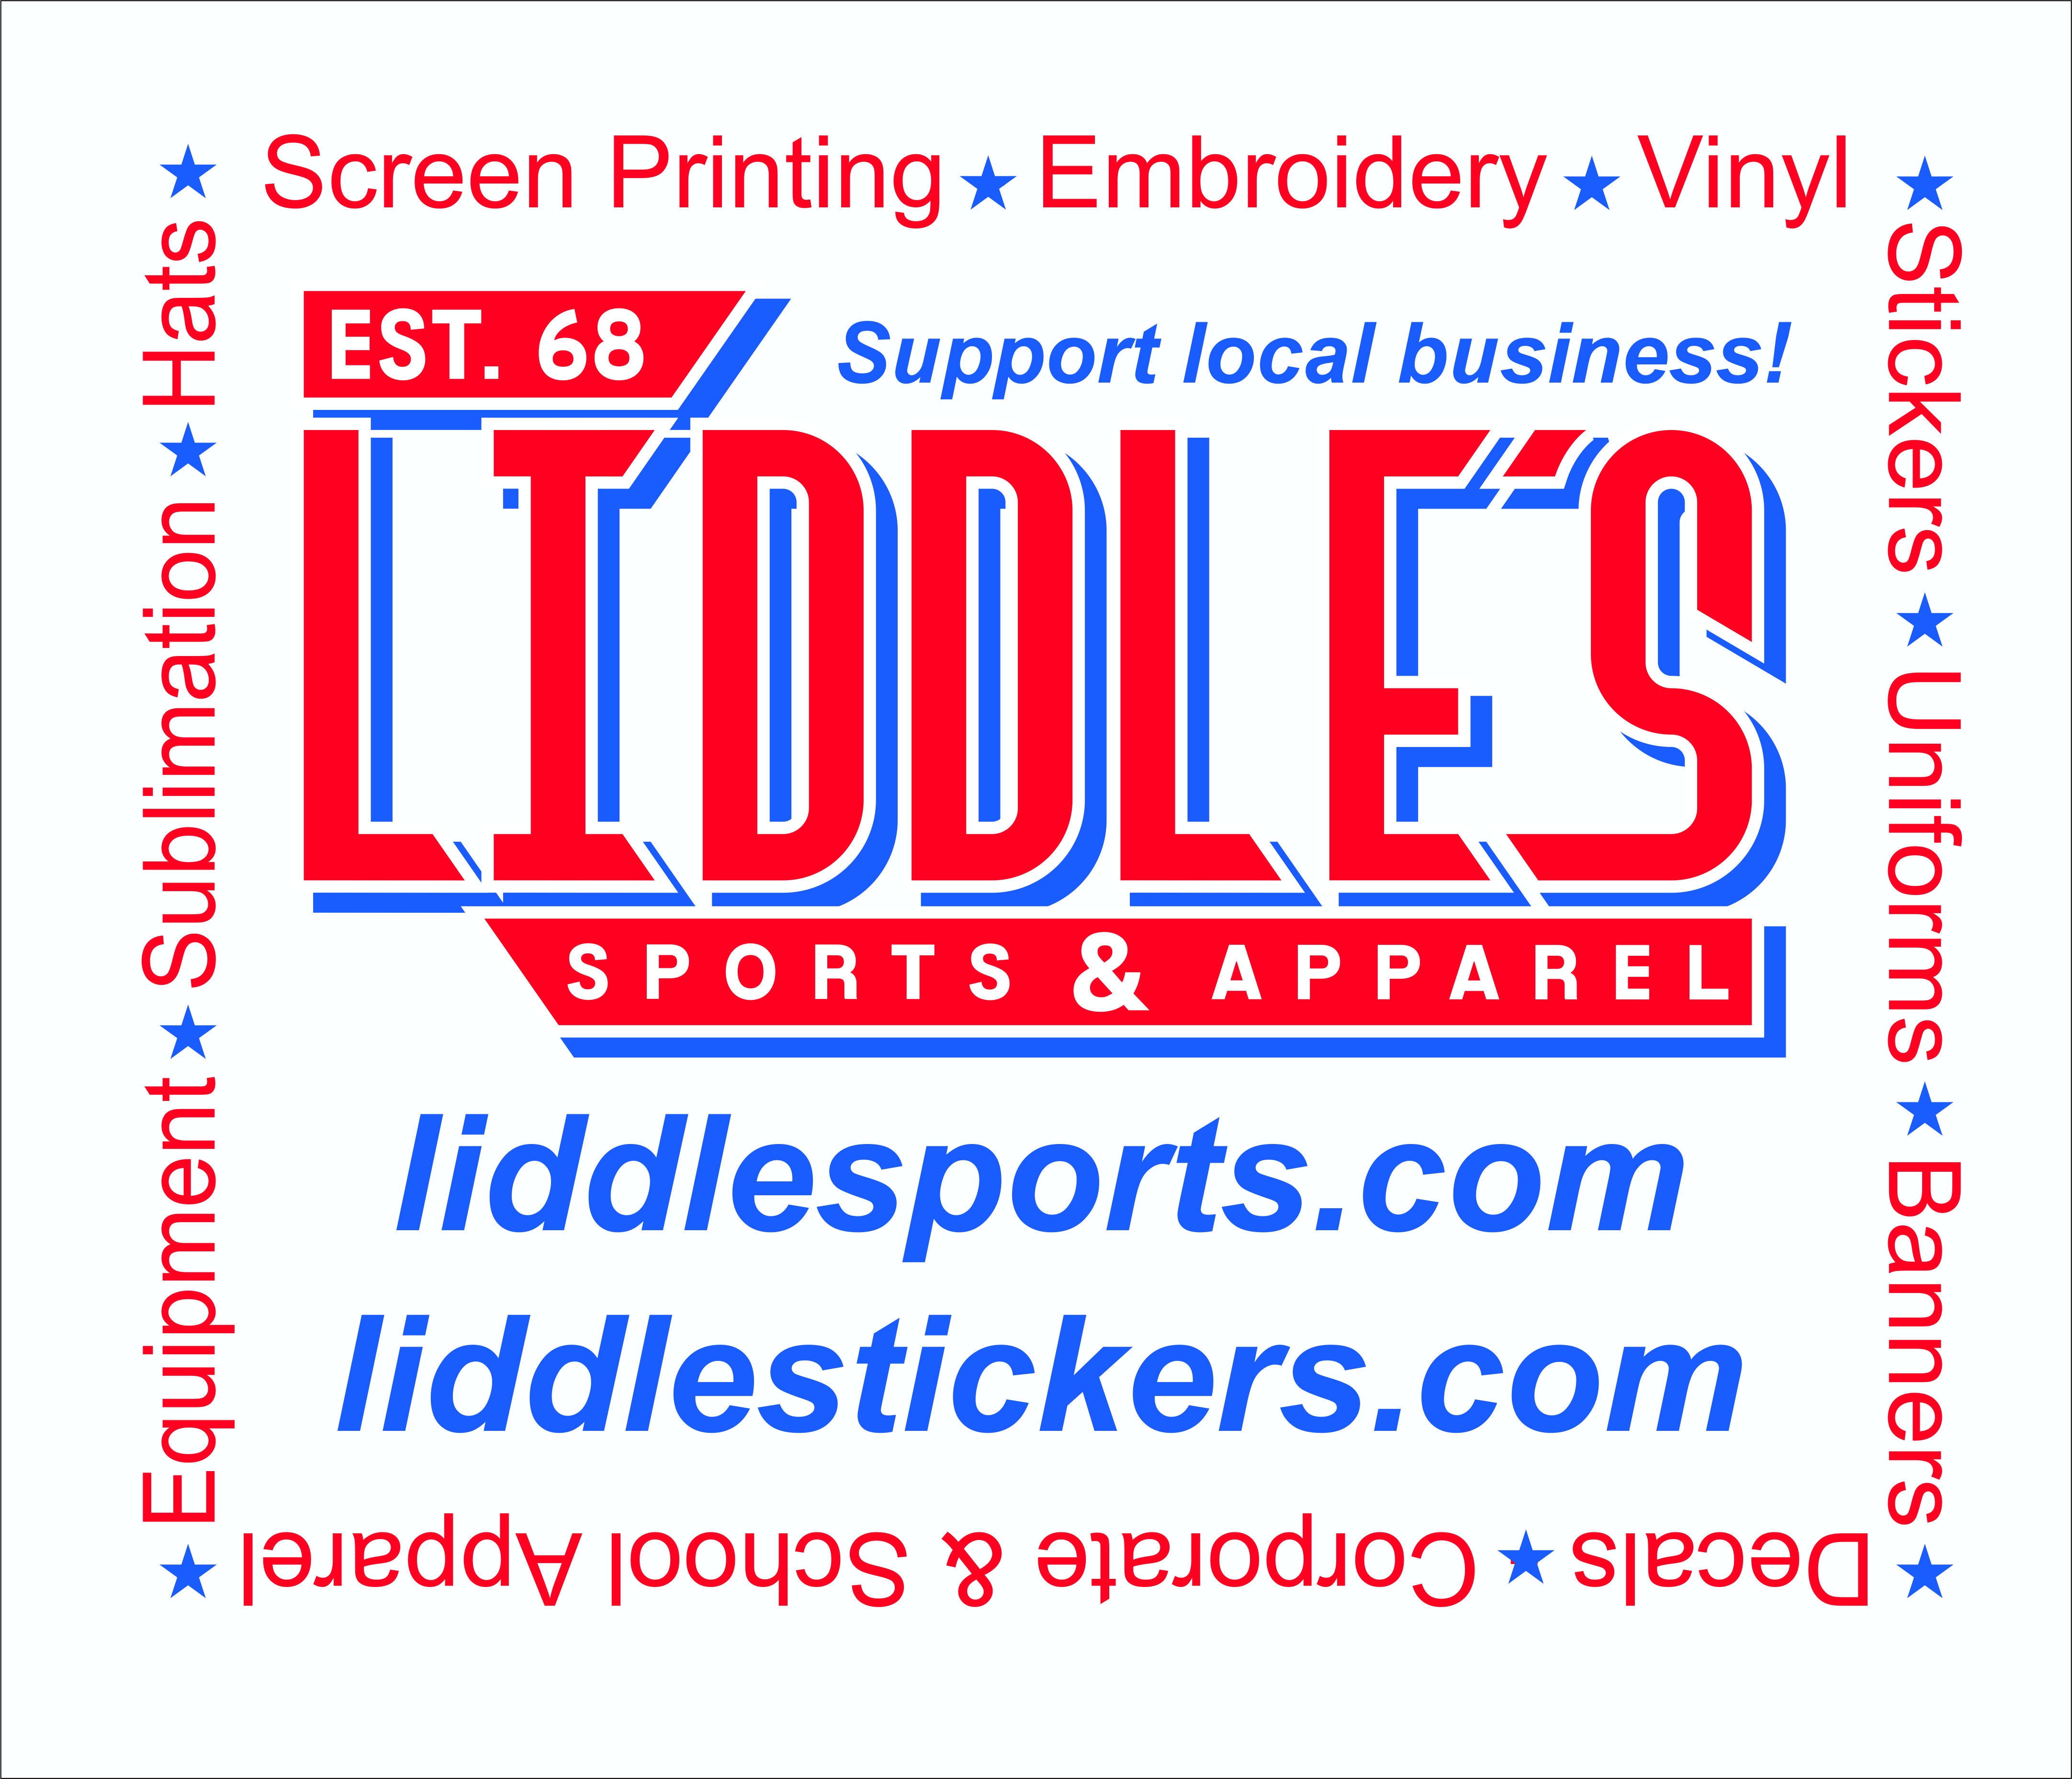 Liddles_PTA